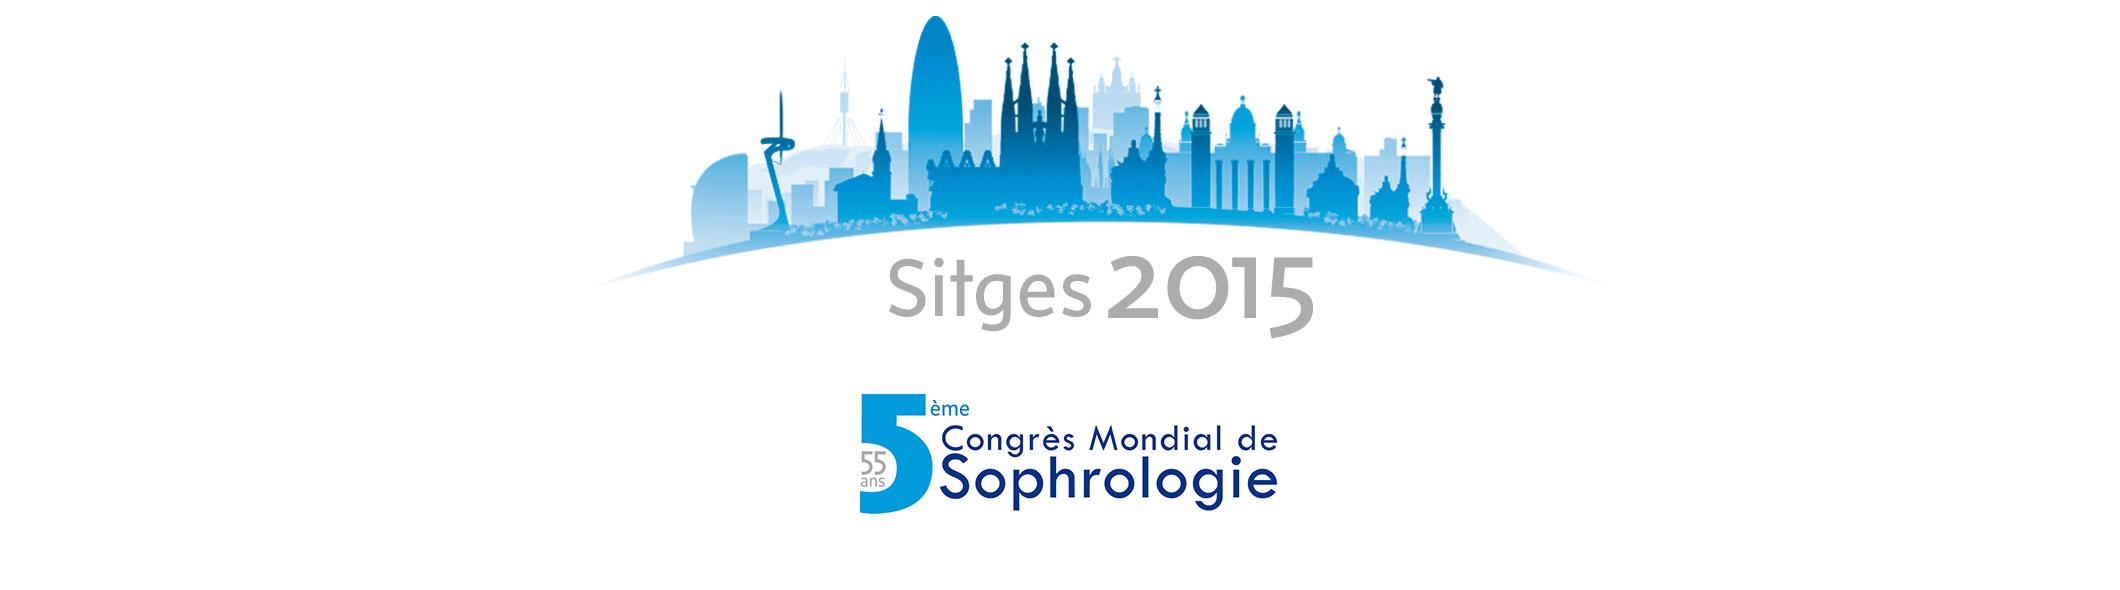 Congres Mondial de Sophrologie Caycedienne